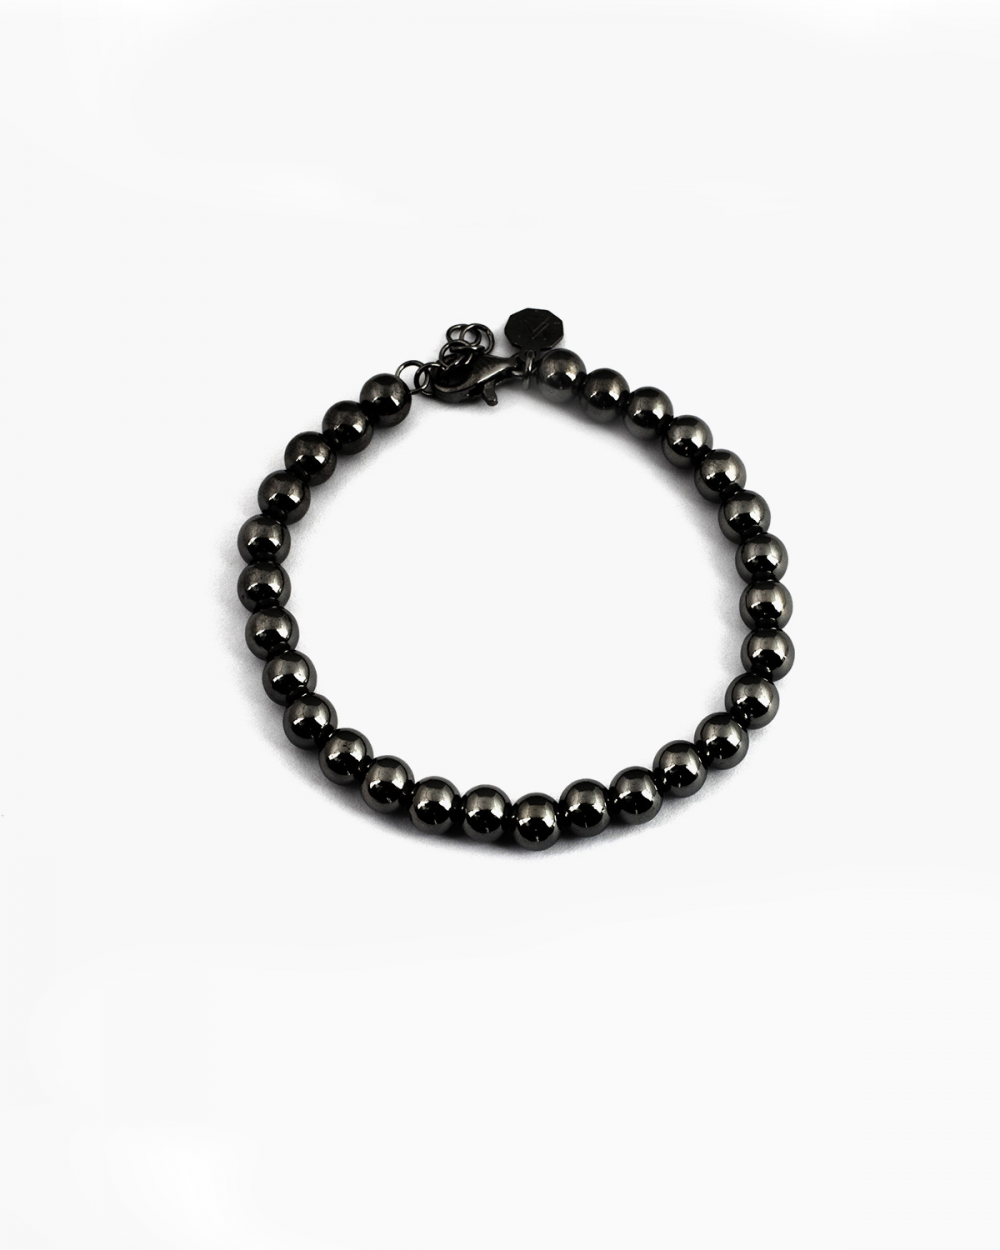 Bracelets RUTHENIUM BALL BRACELET 600 NOVE25